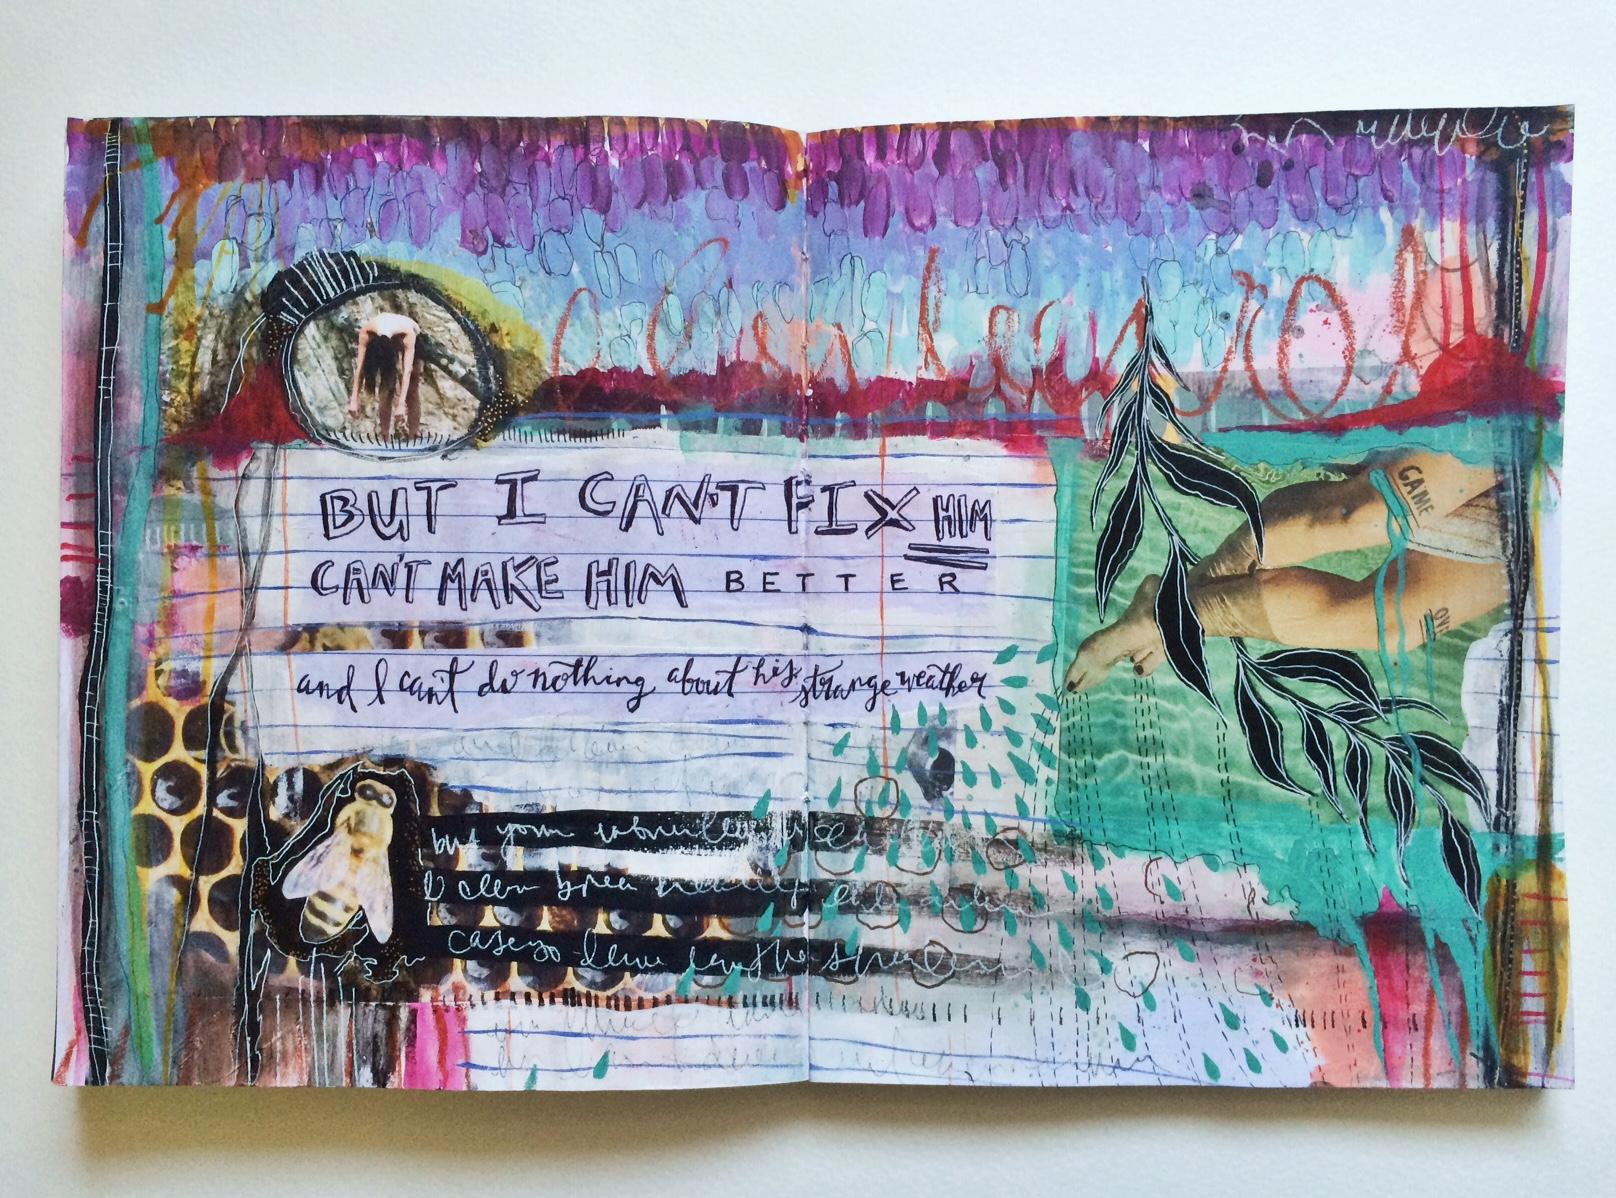 Previous events way art yonder studio lyrical live buycottarizona Images